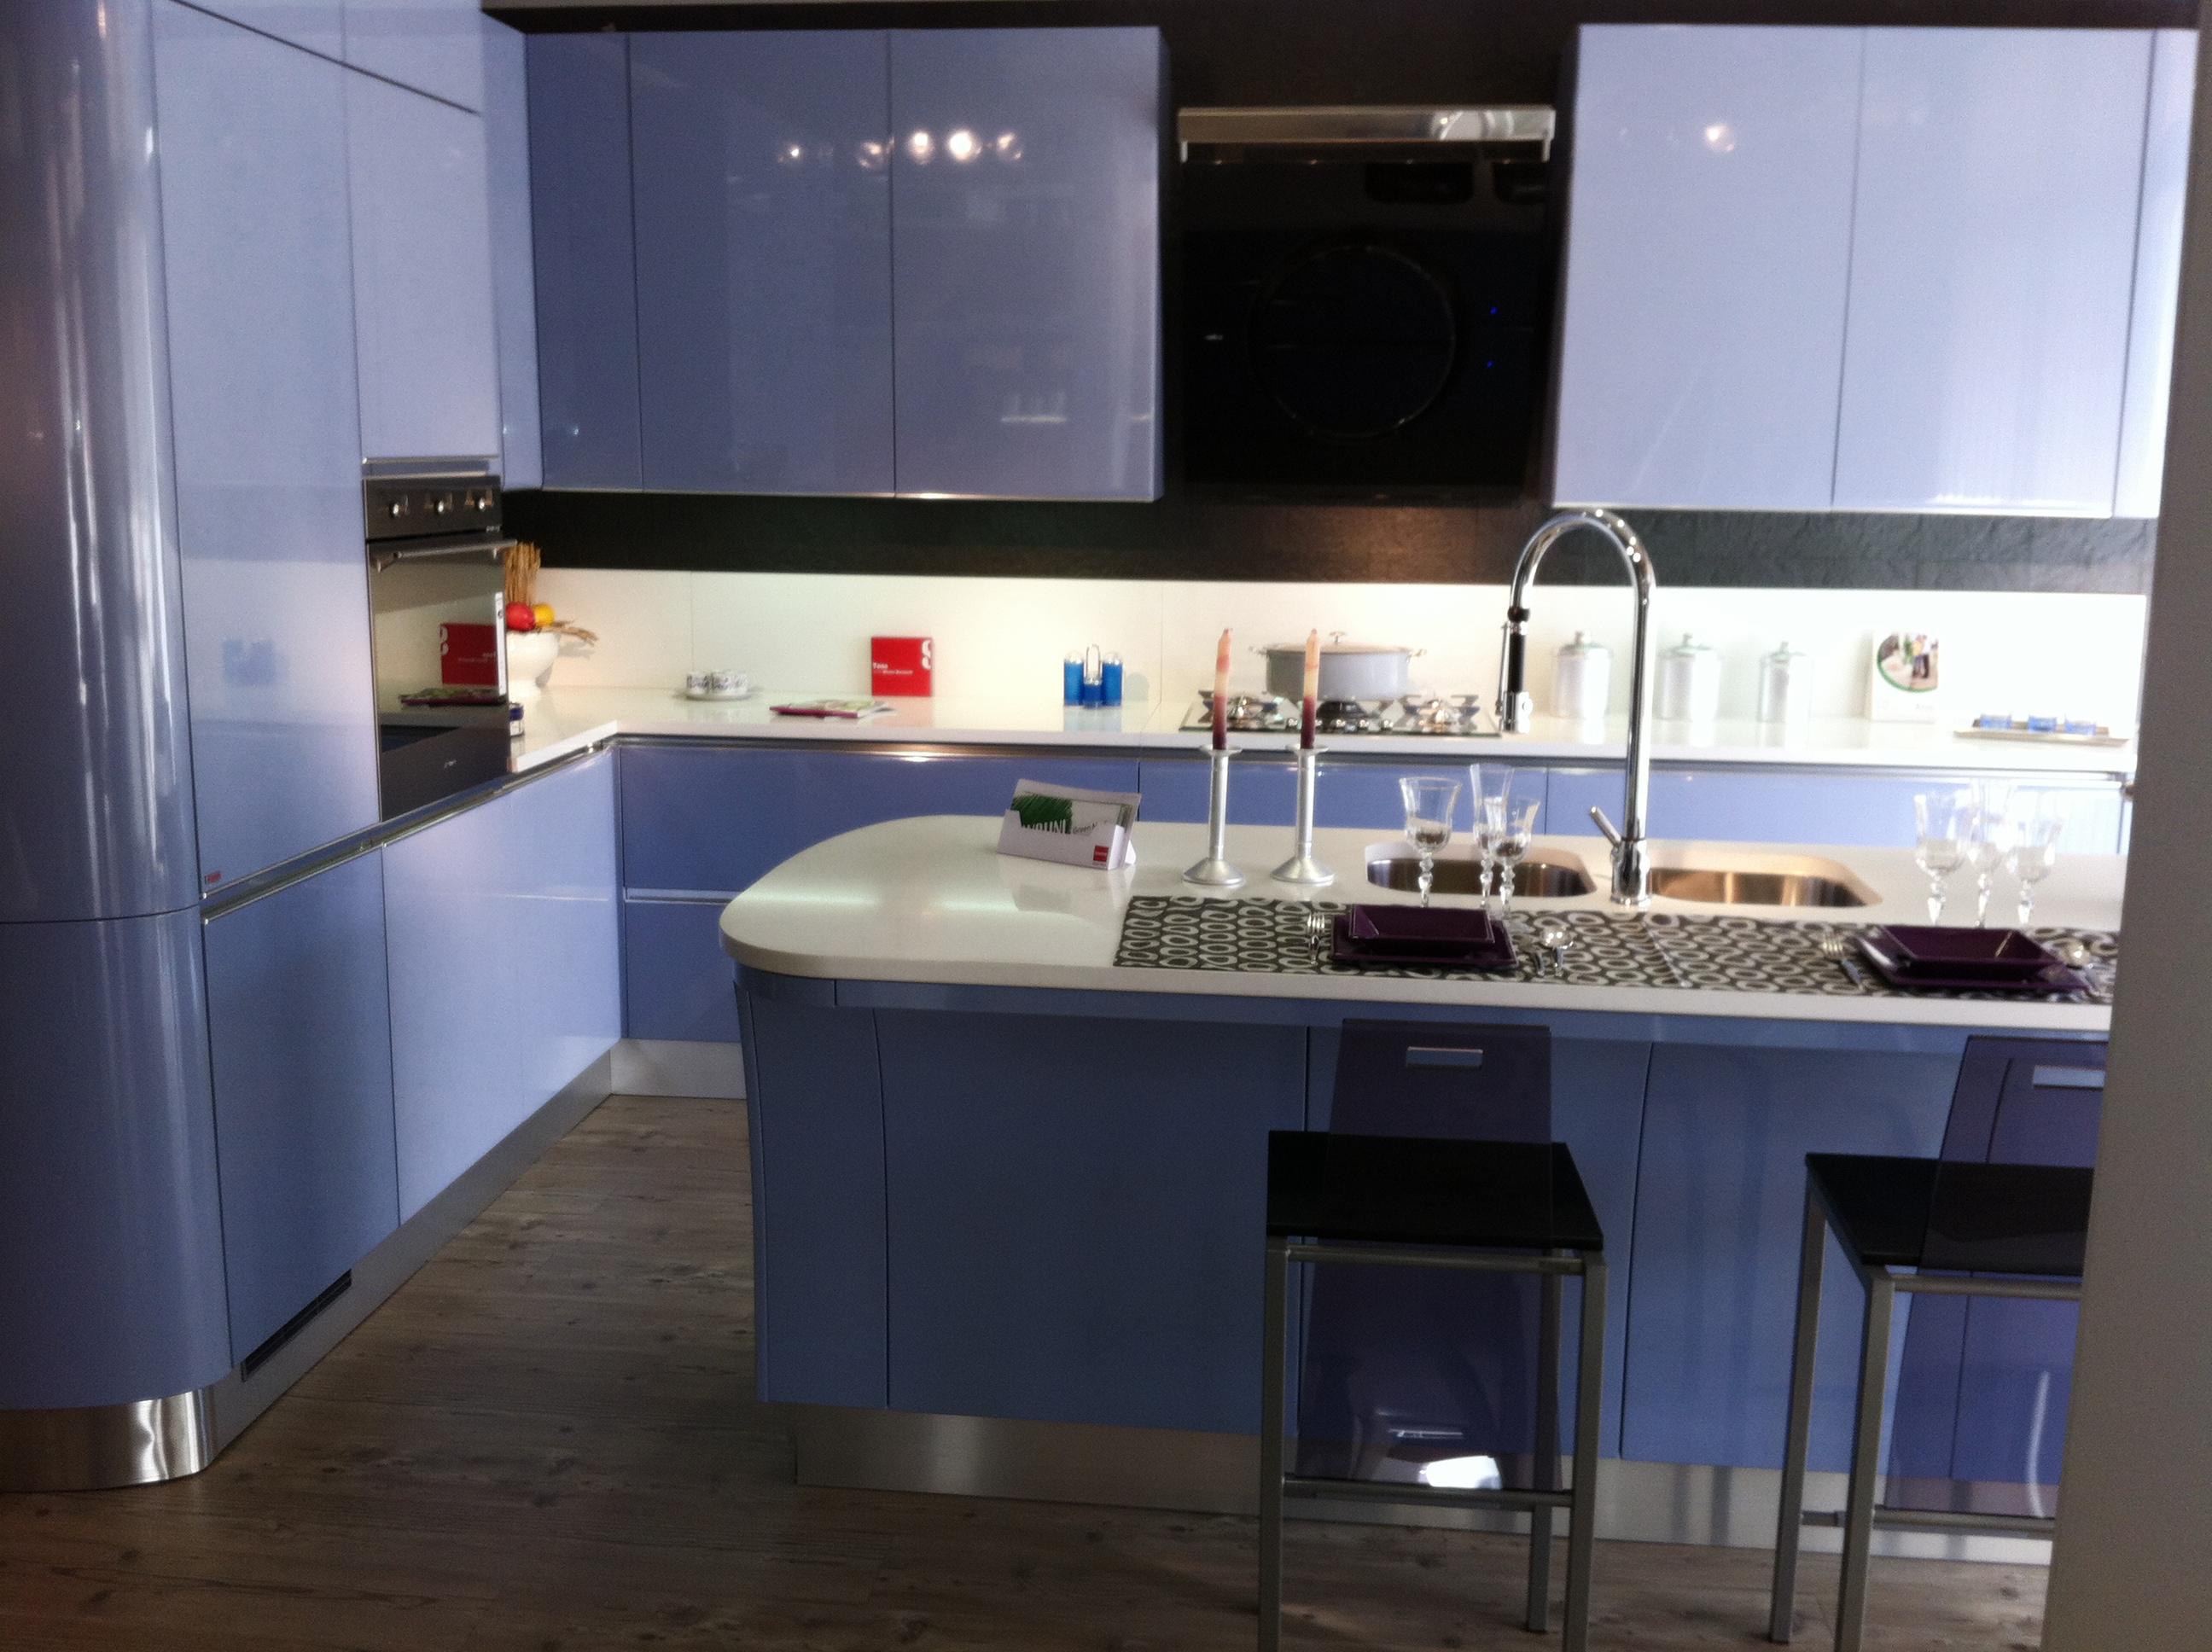 Offerta scavolini tess azzurra cucine a prezzi scontati - Prezzi cucine scavolini moderne ...